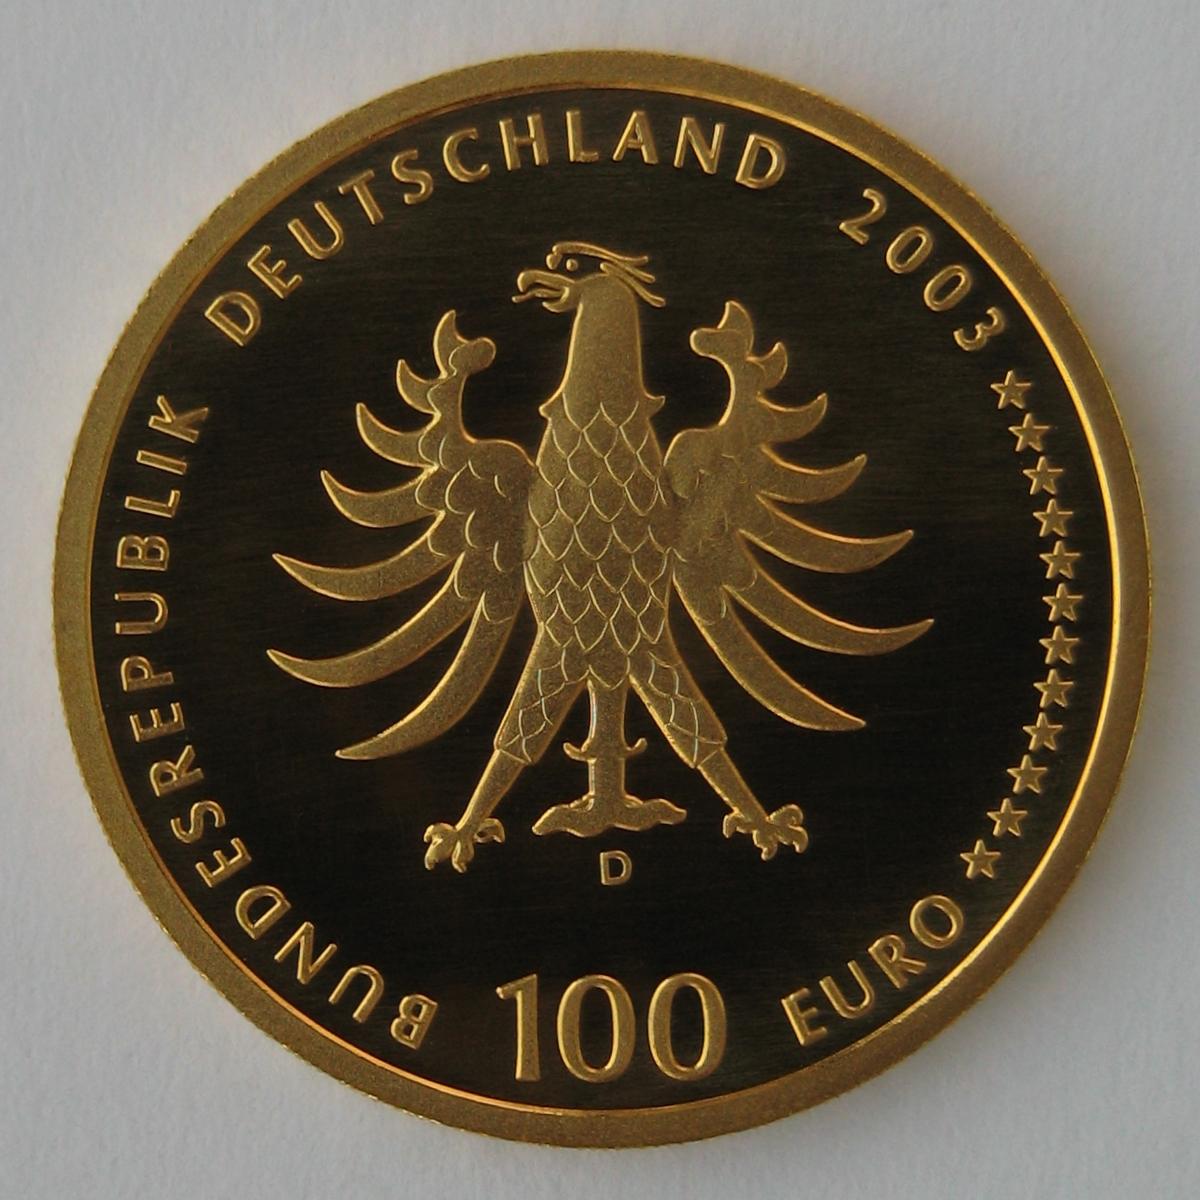 ... Gedenkmünzen 2003 Polierte Platte Offizieller Blister mit Chancen messi ballon d zu gewinnen oder 10 Euro